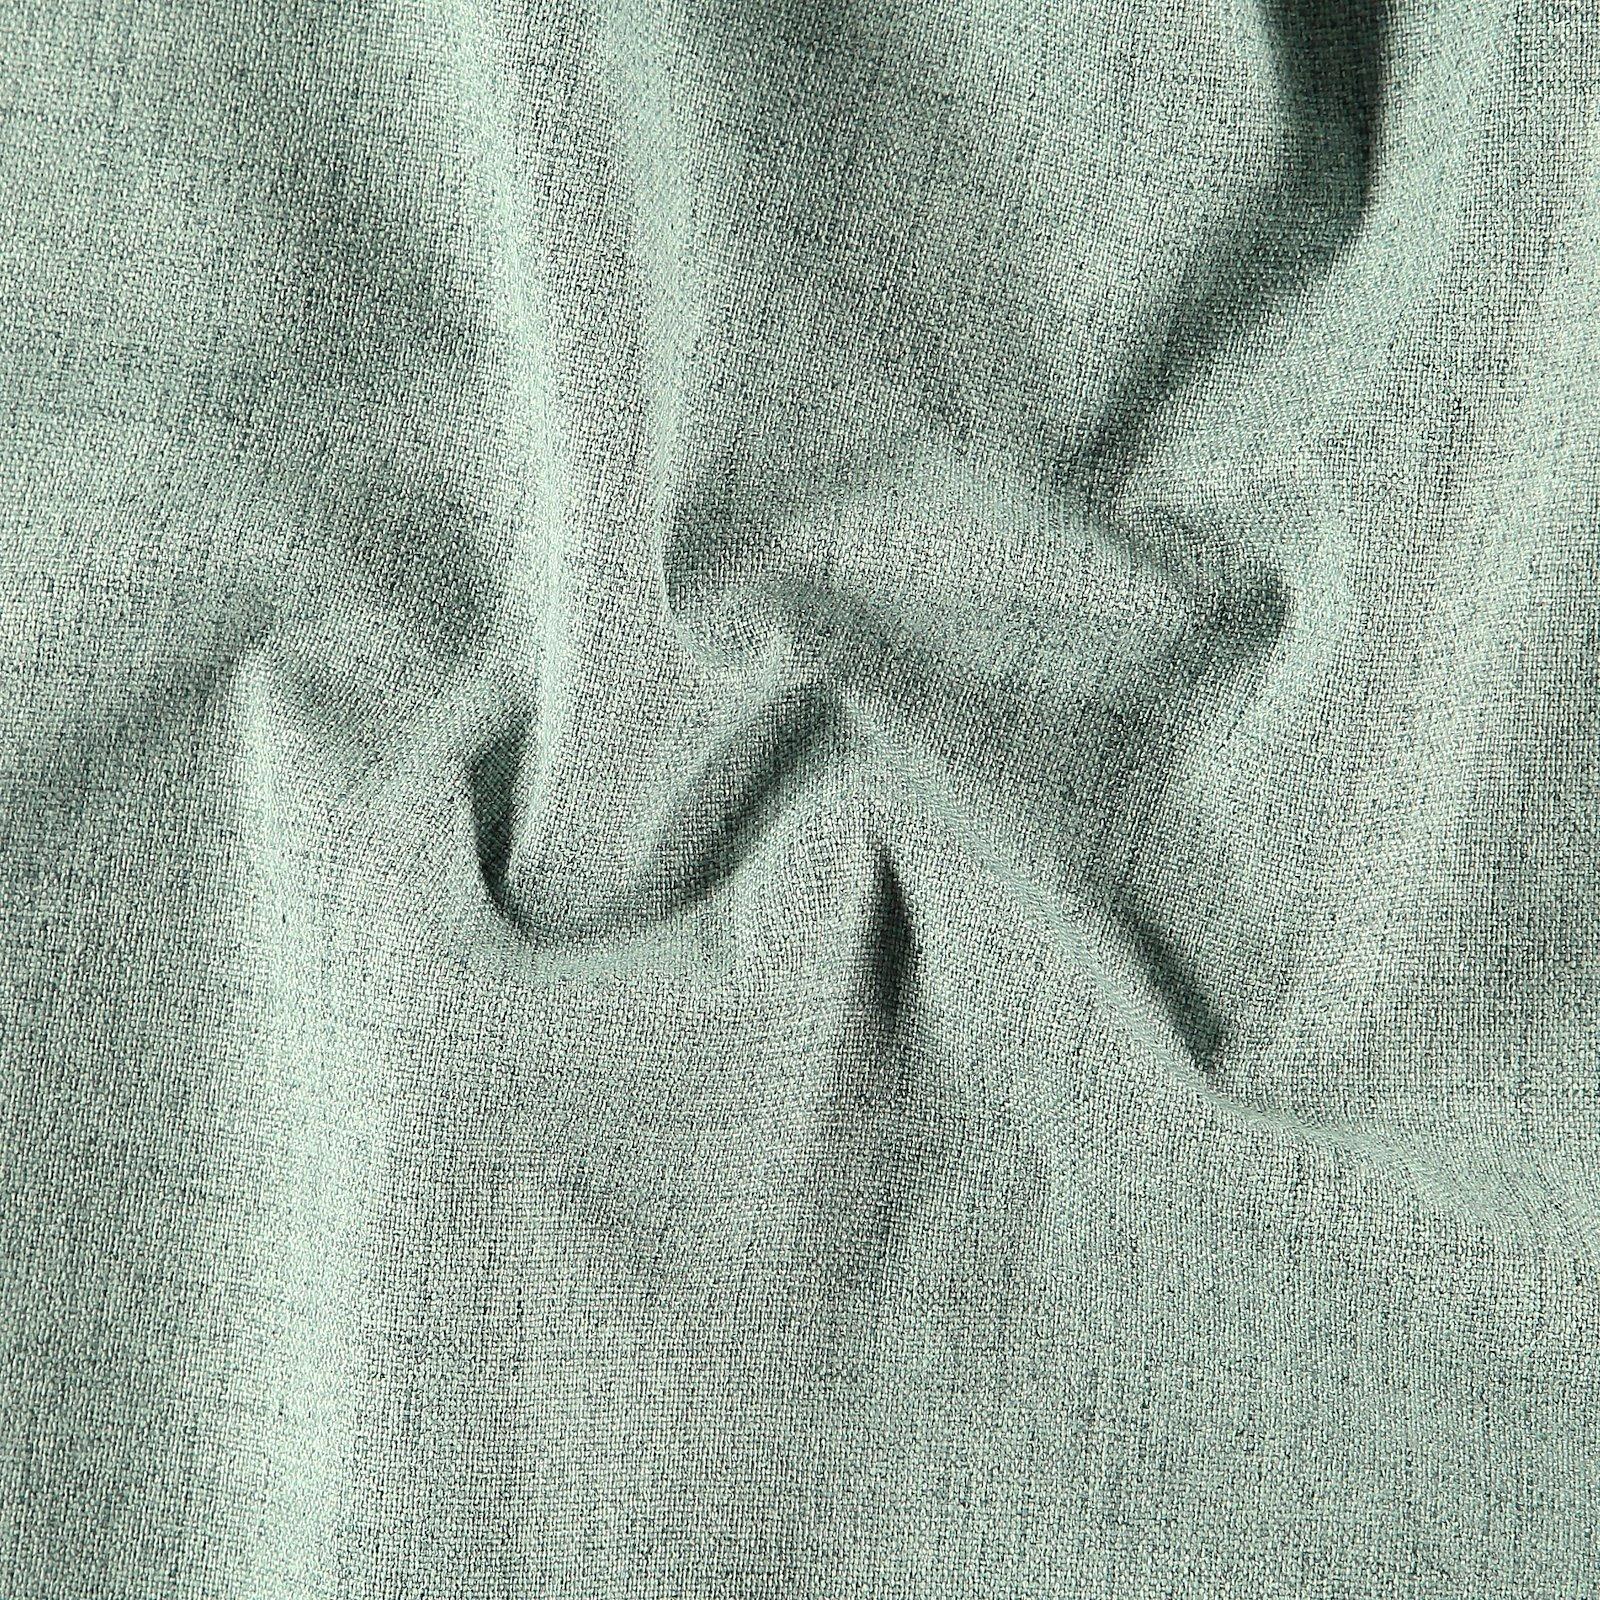 Upholstery fabric w/backing dusty aqua